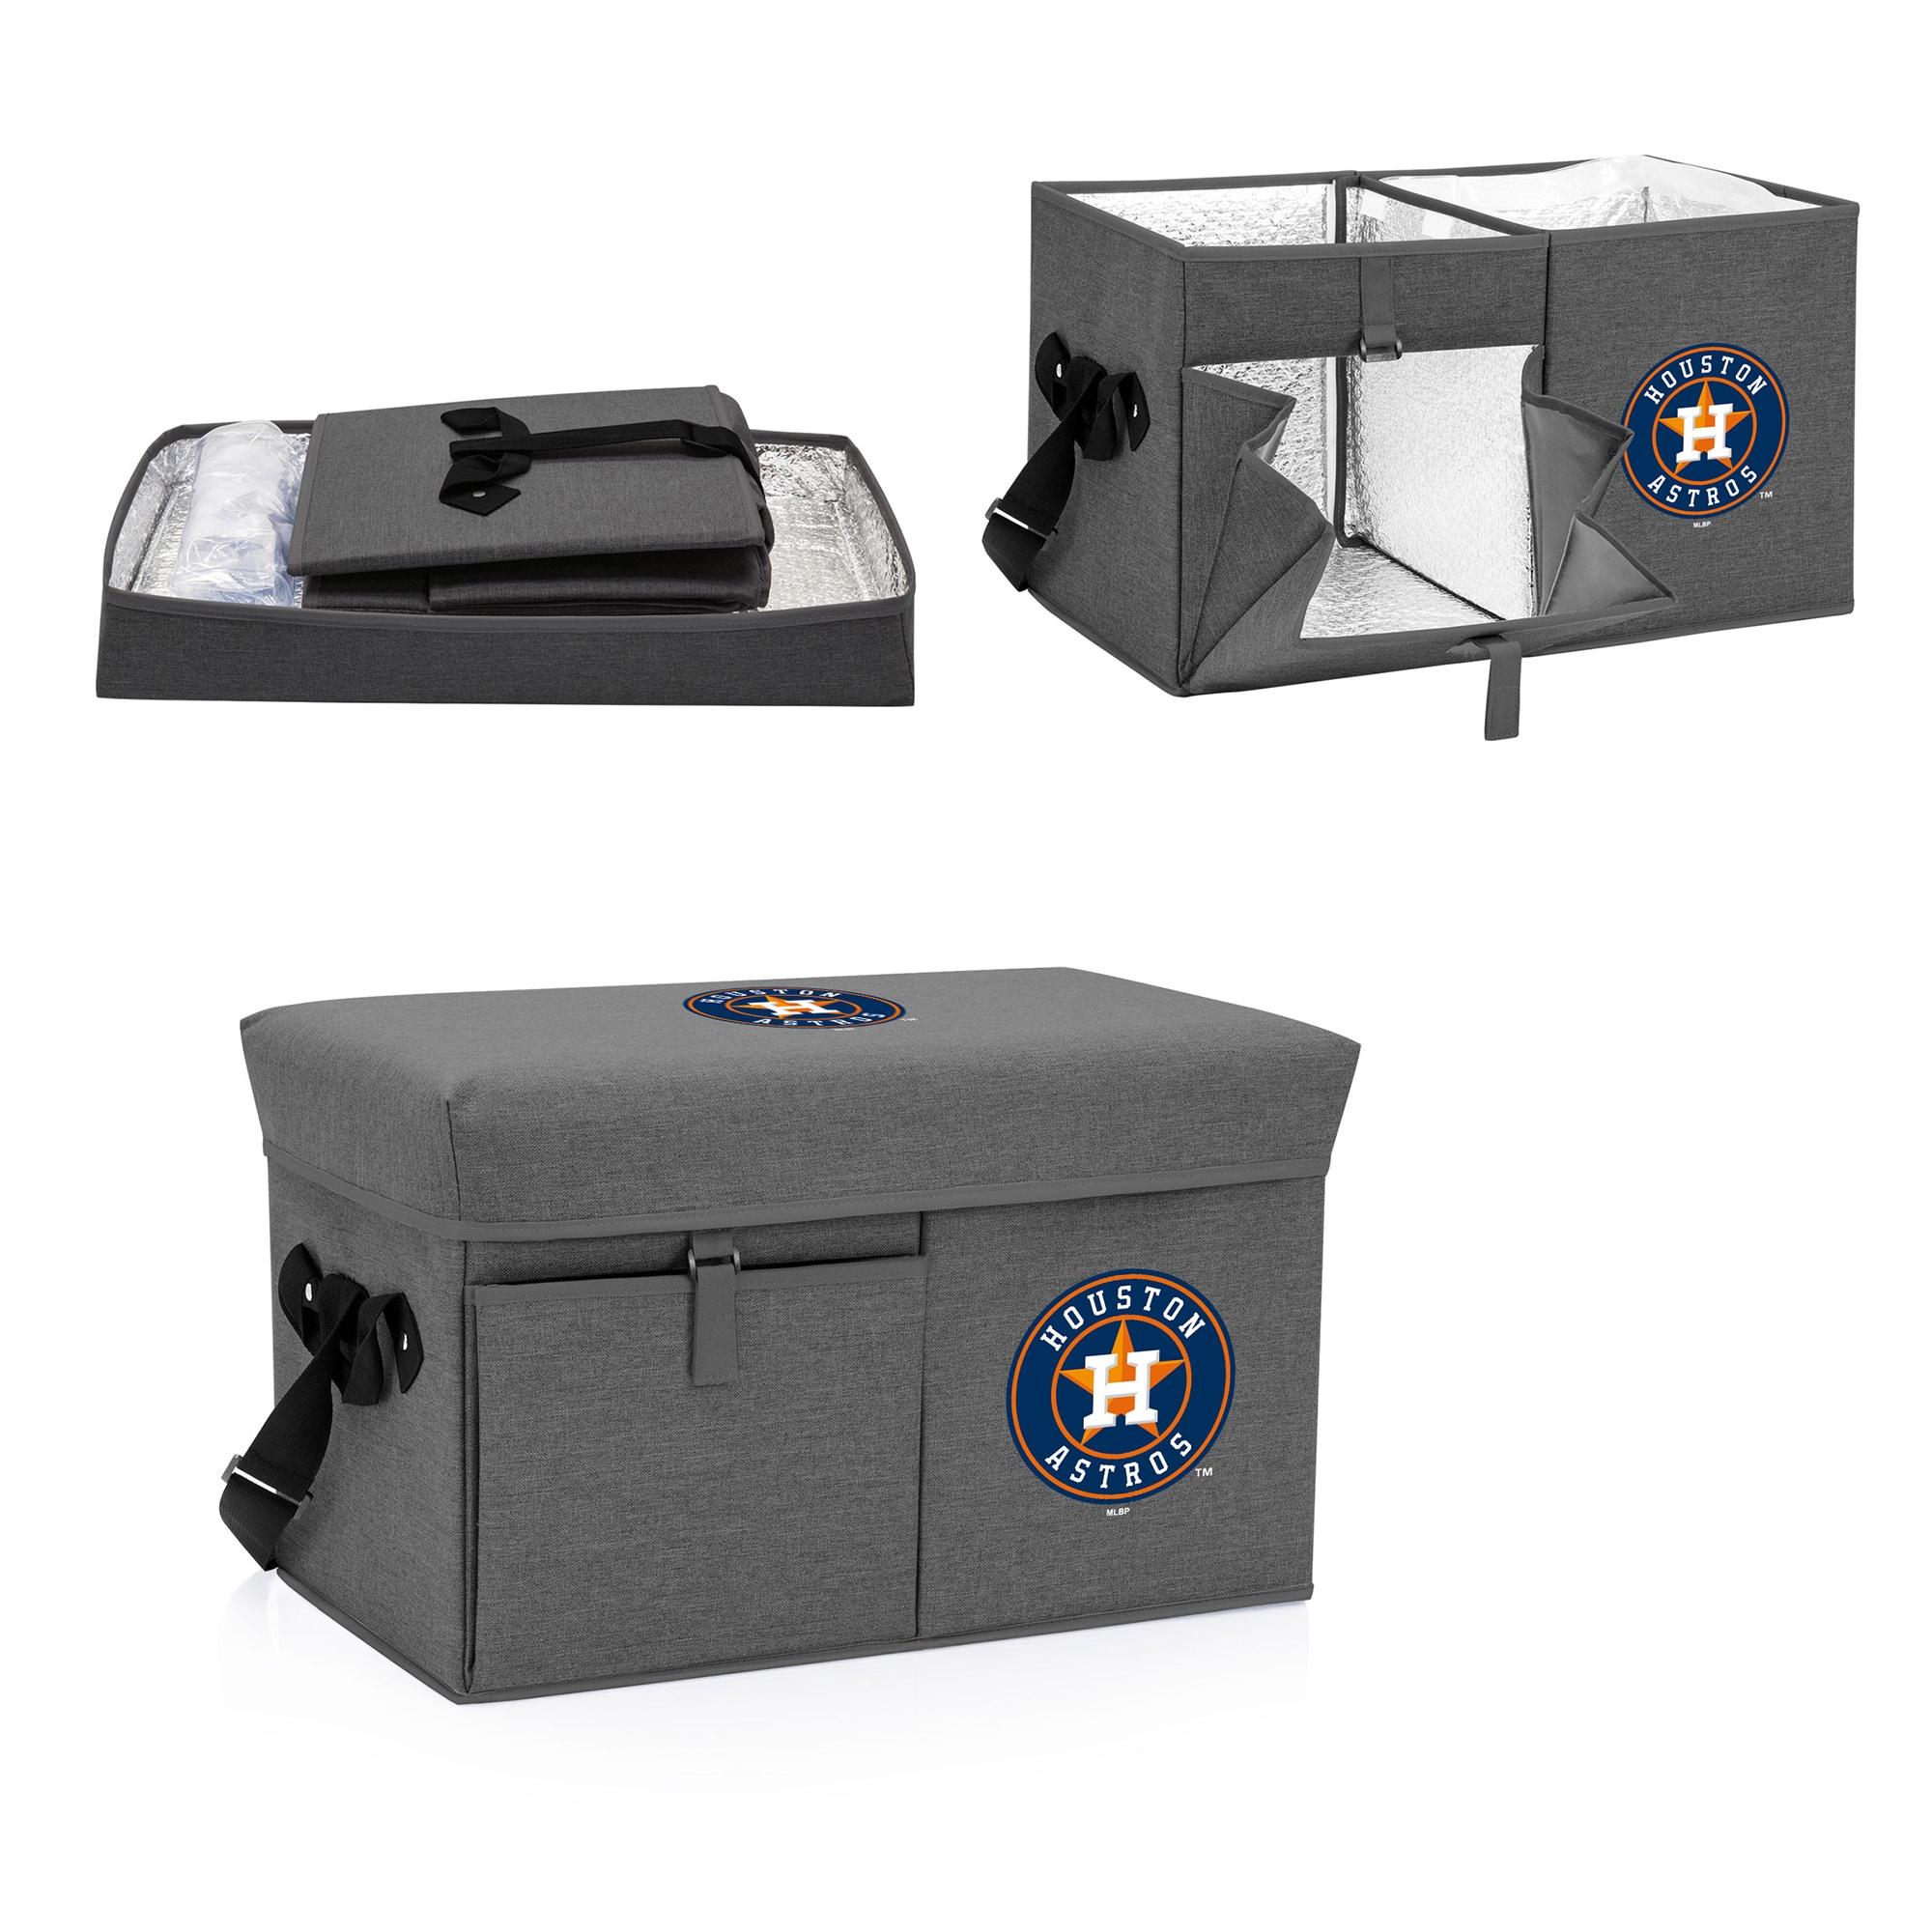 Houston Astros Ottoman Cooler & Seat - Gray